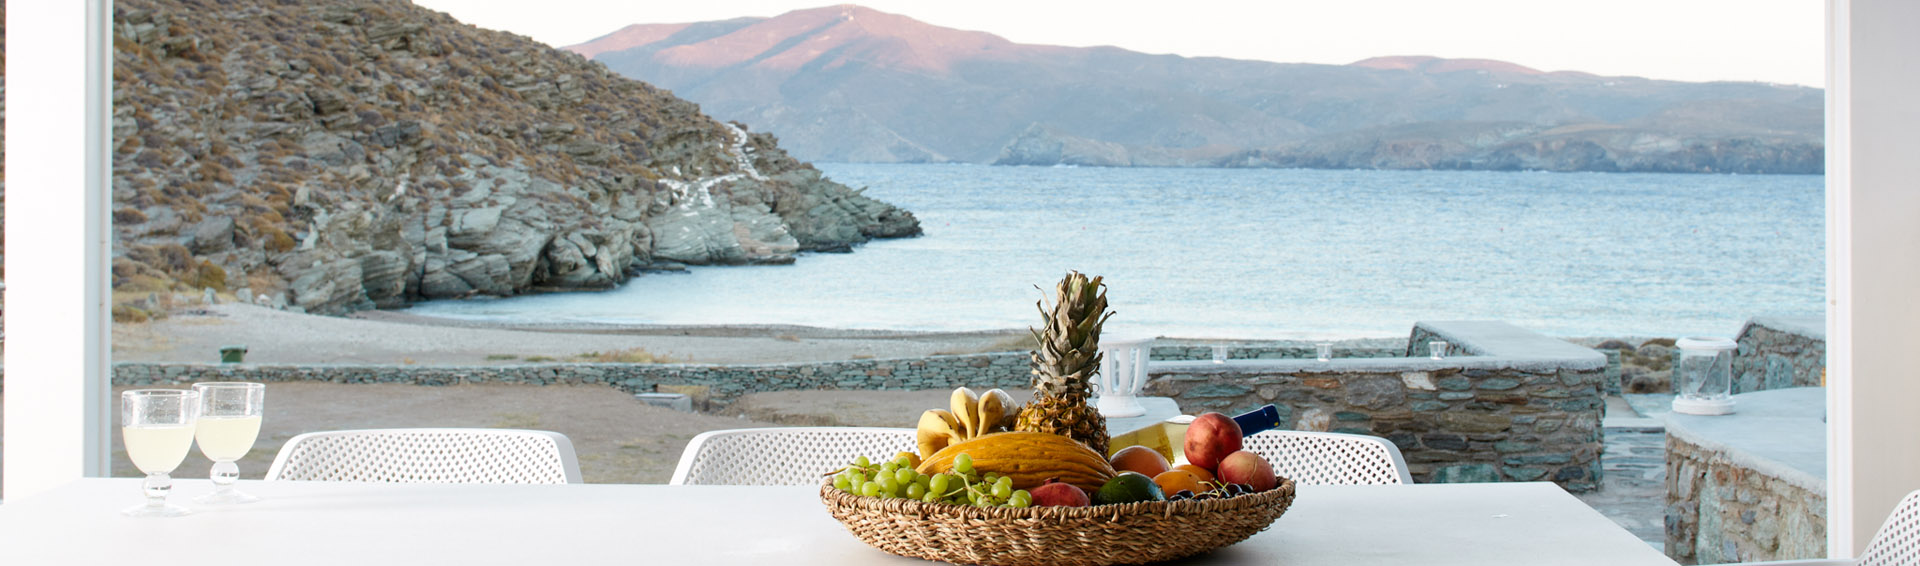 Eneos Kythnos Beach Villas executive